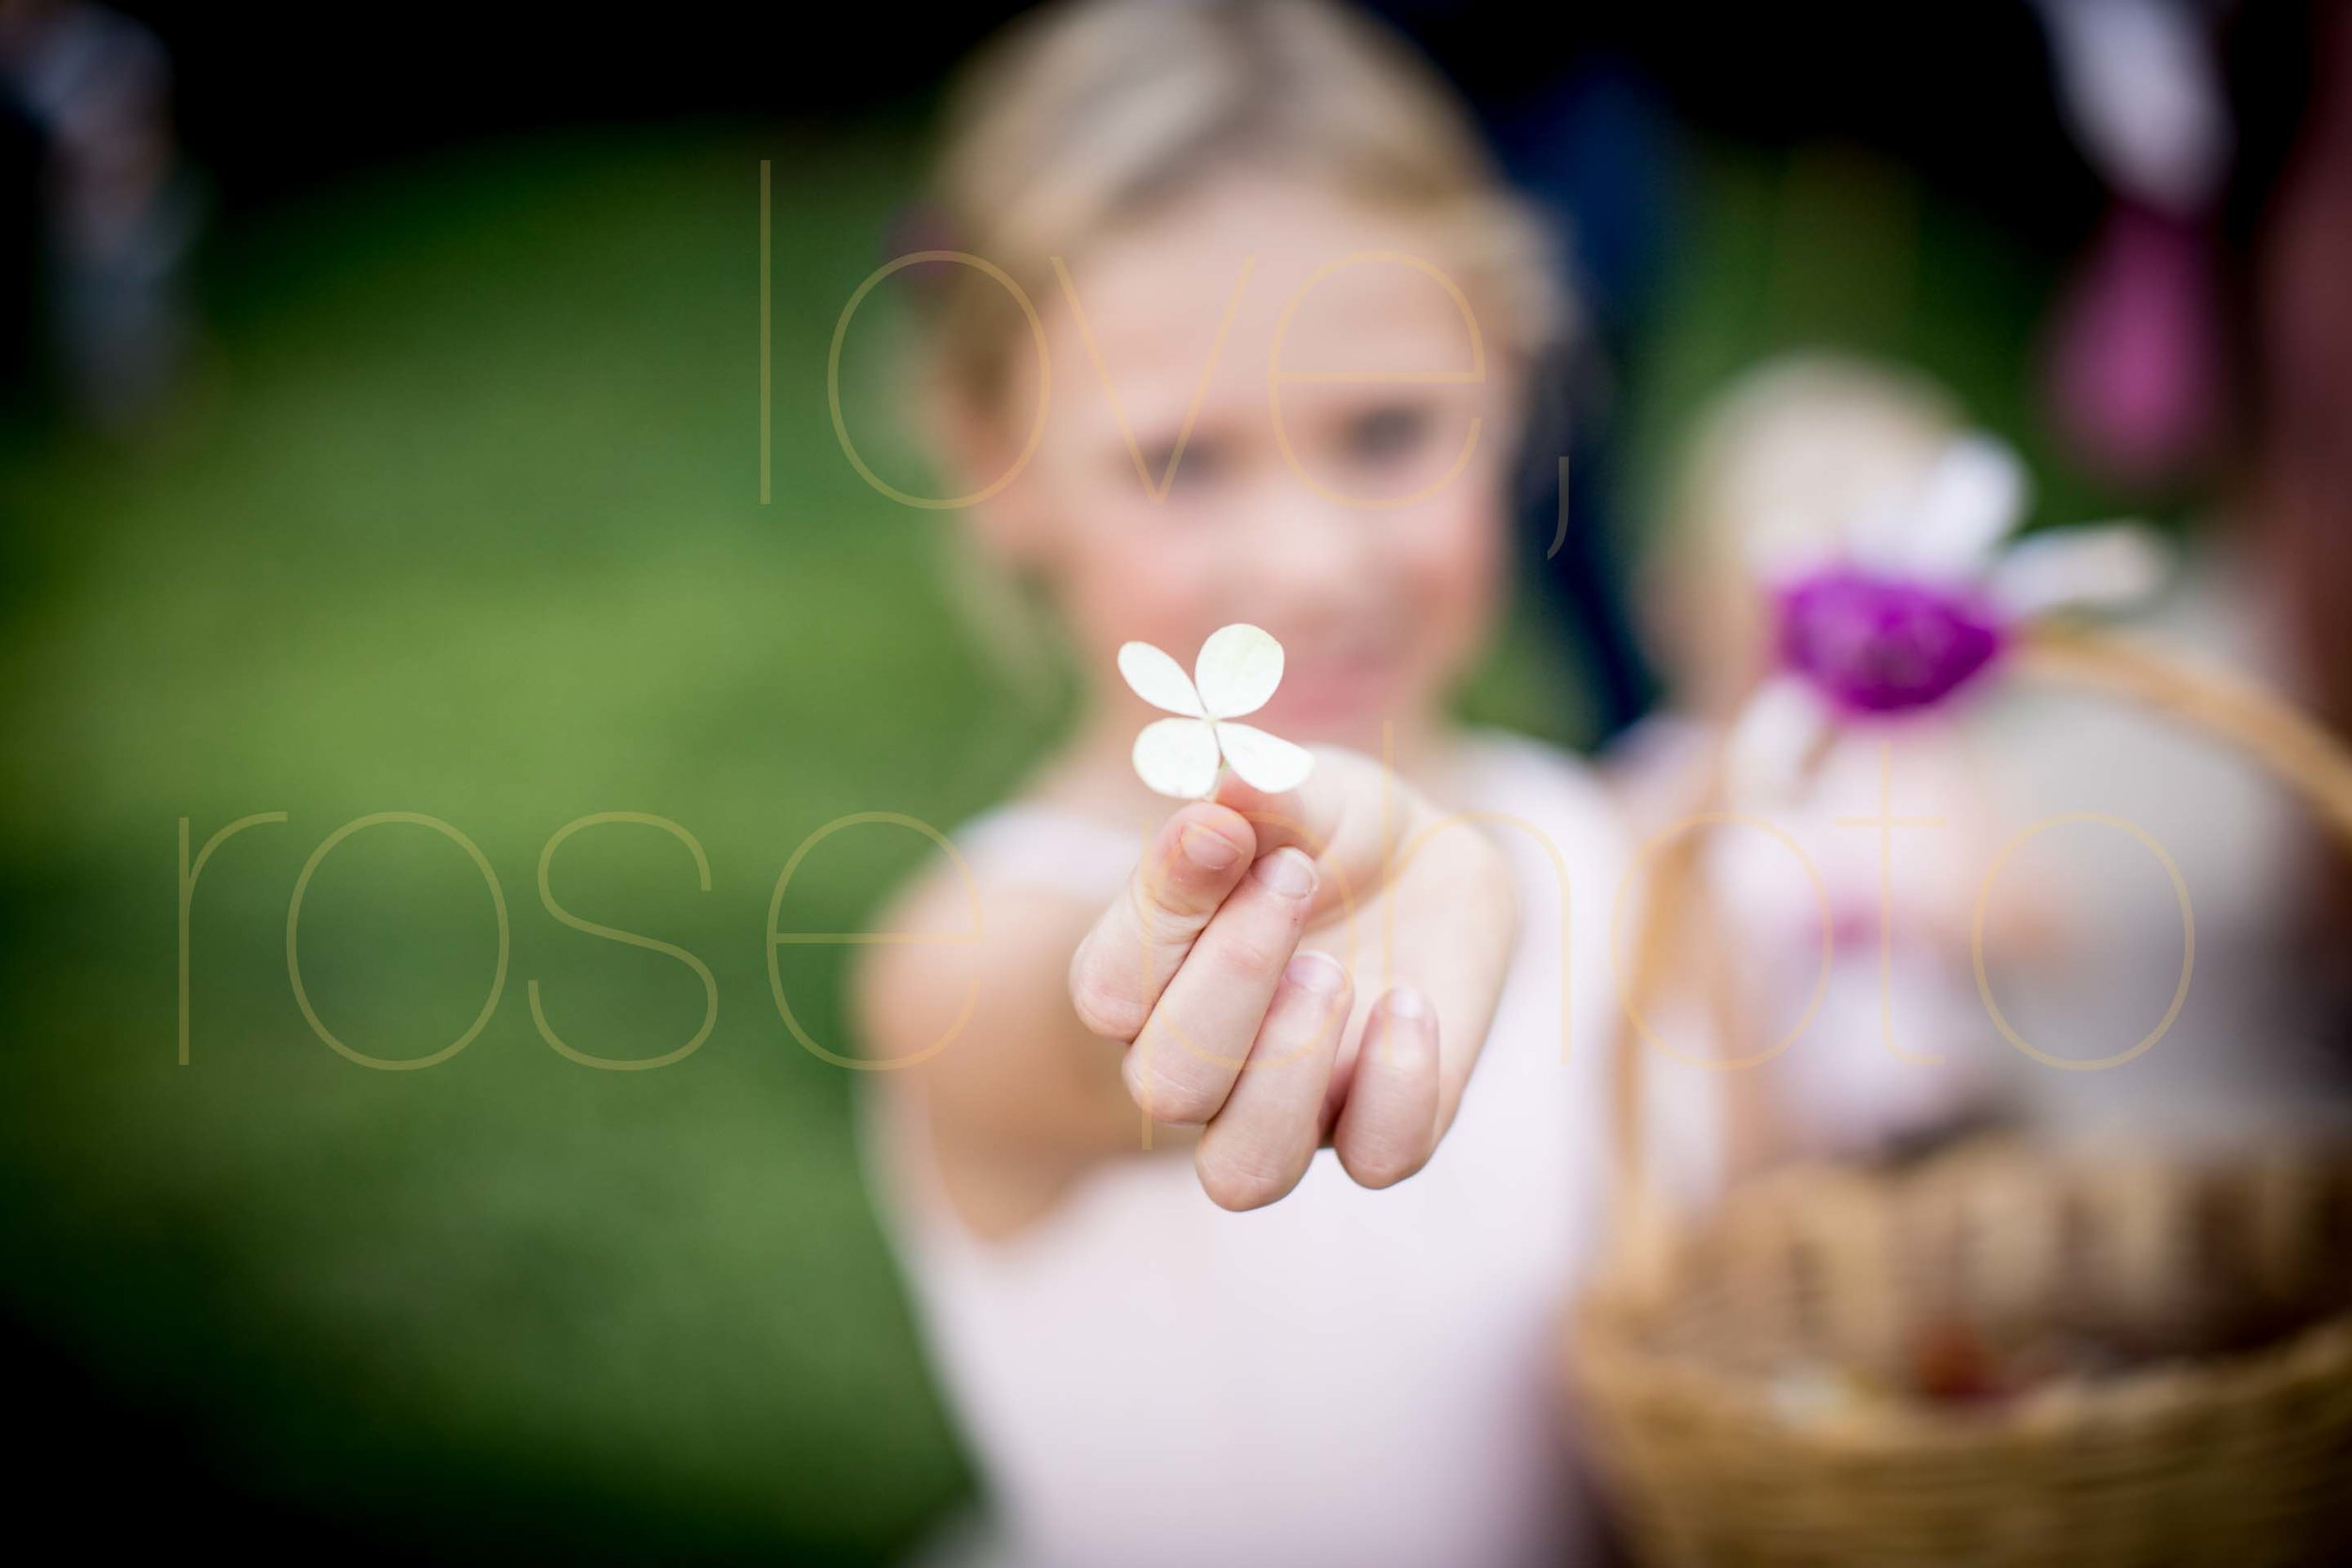 Rose Photo Asheville Wedding Photographer Nasheville Weddings Charleston Bride Chicago photojournalist weddings -34.jpg